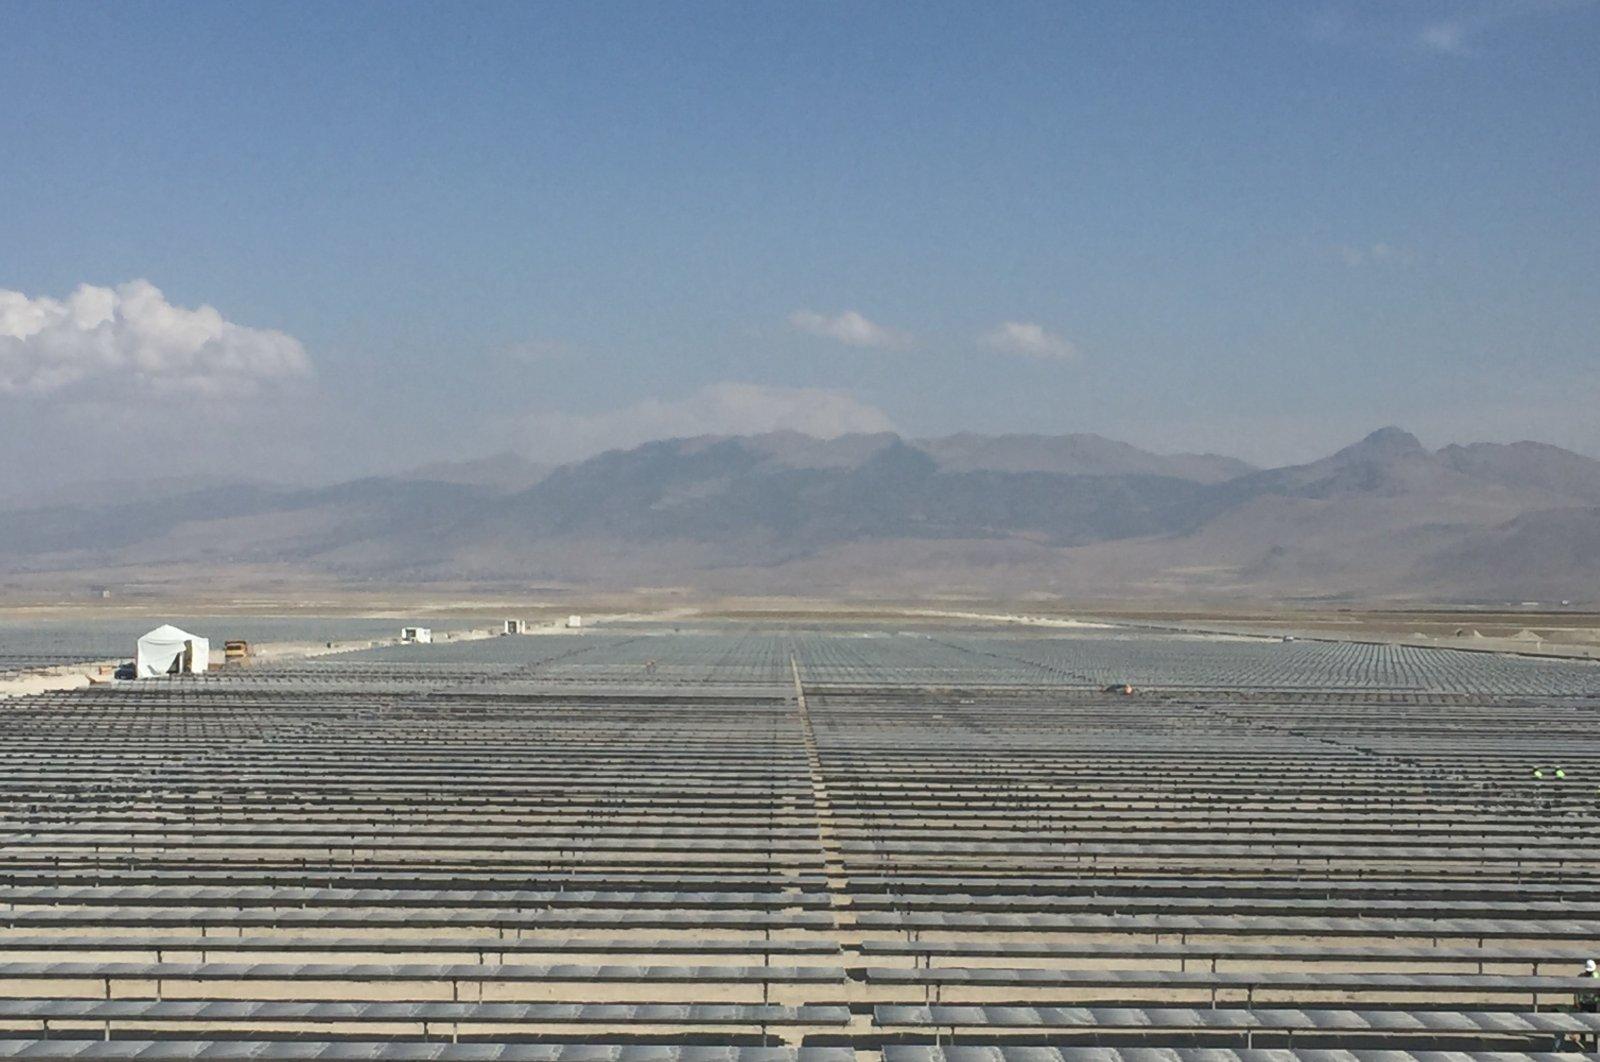 A view from Karapınar Solar Power Plant in central Konya province, Turkey, Sept. 28, 2020. (AA Photo)